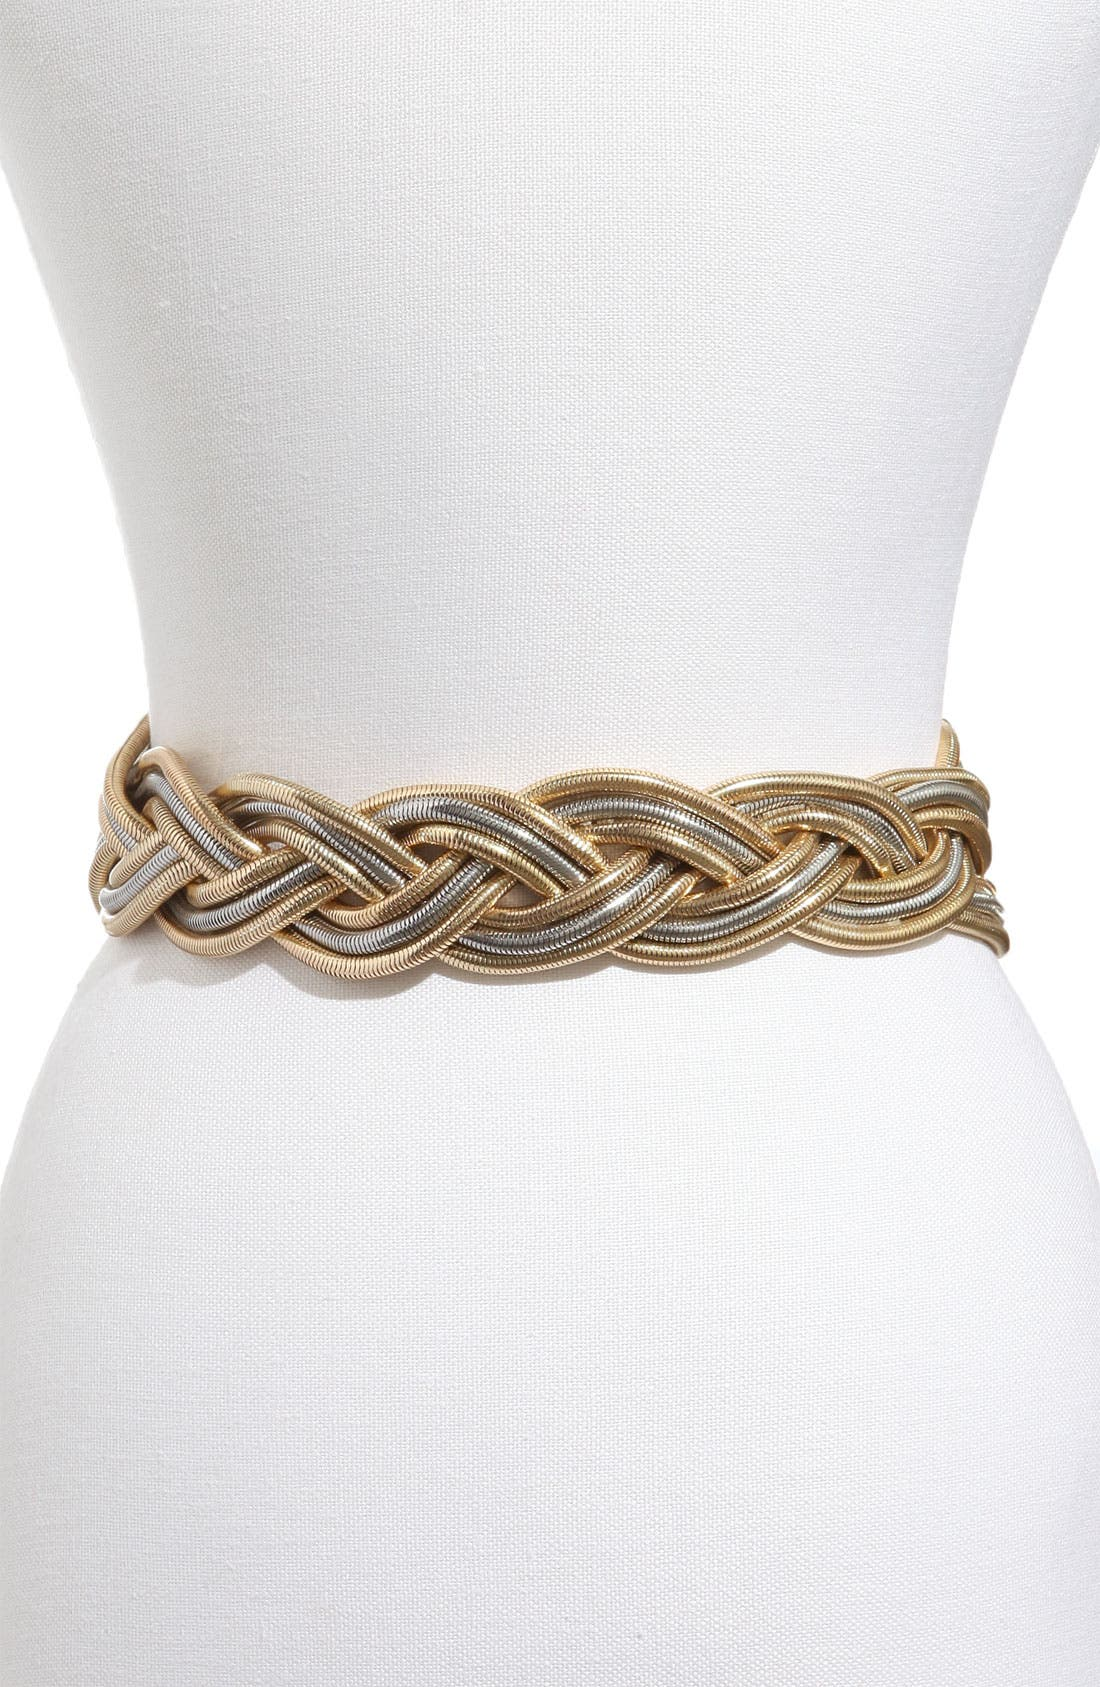 Main Image - Raina 'Dynasty' Belt